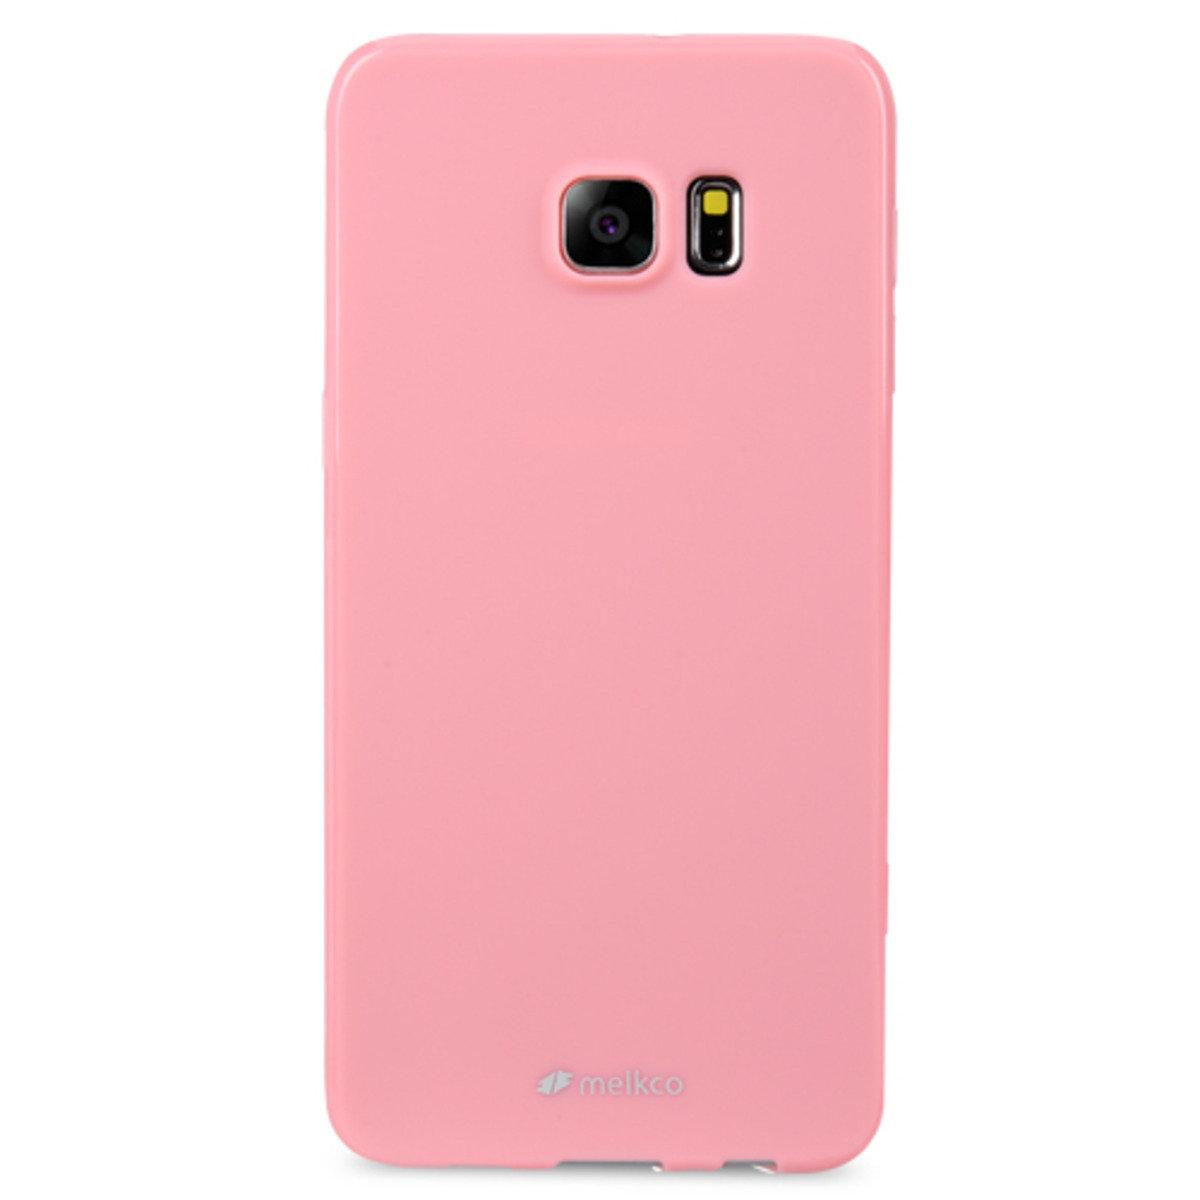 Galaxy S6 Edge Plus Poly Jacket手機保護殼 - 珍珠粉紅色(附送屏幕保護貼)